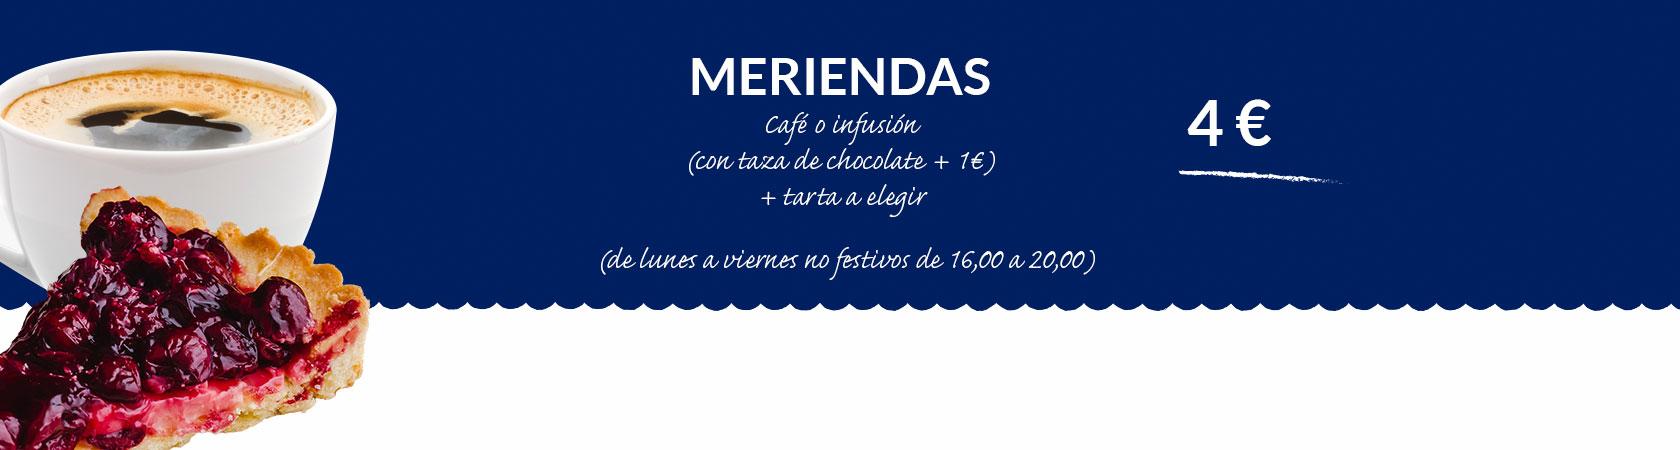 cabecera_mar_descumpleaños_v7